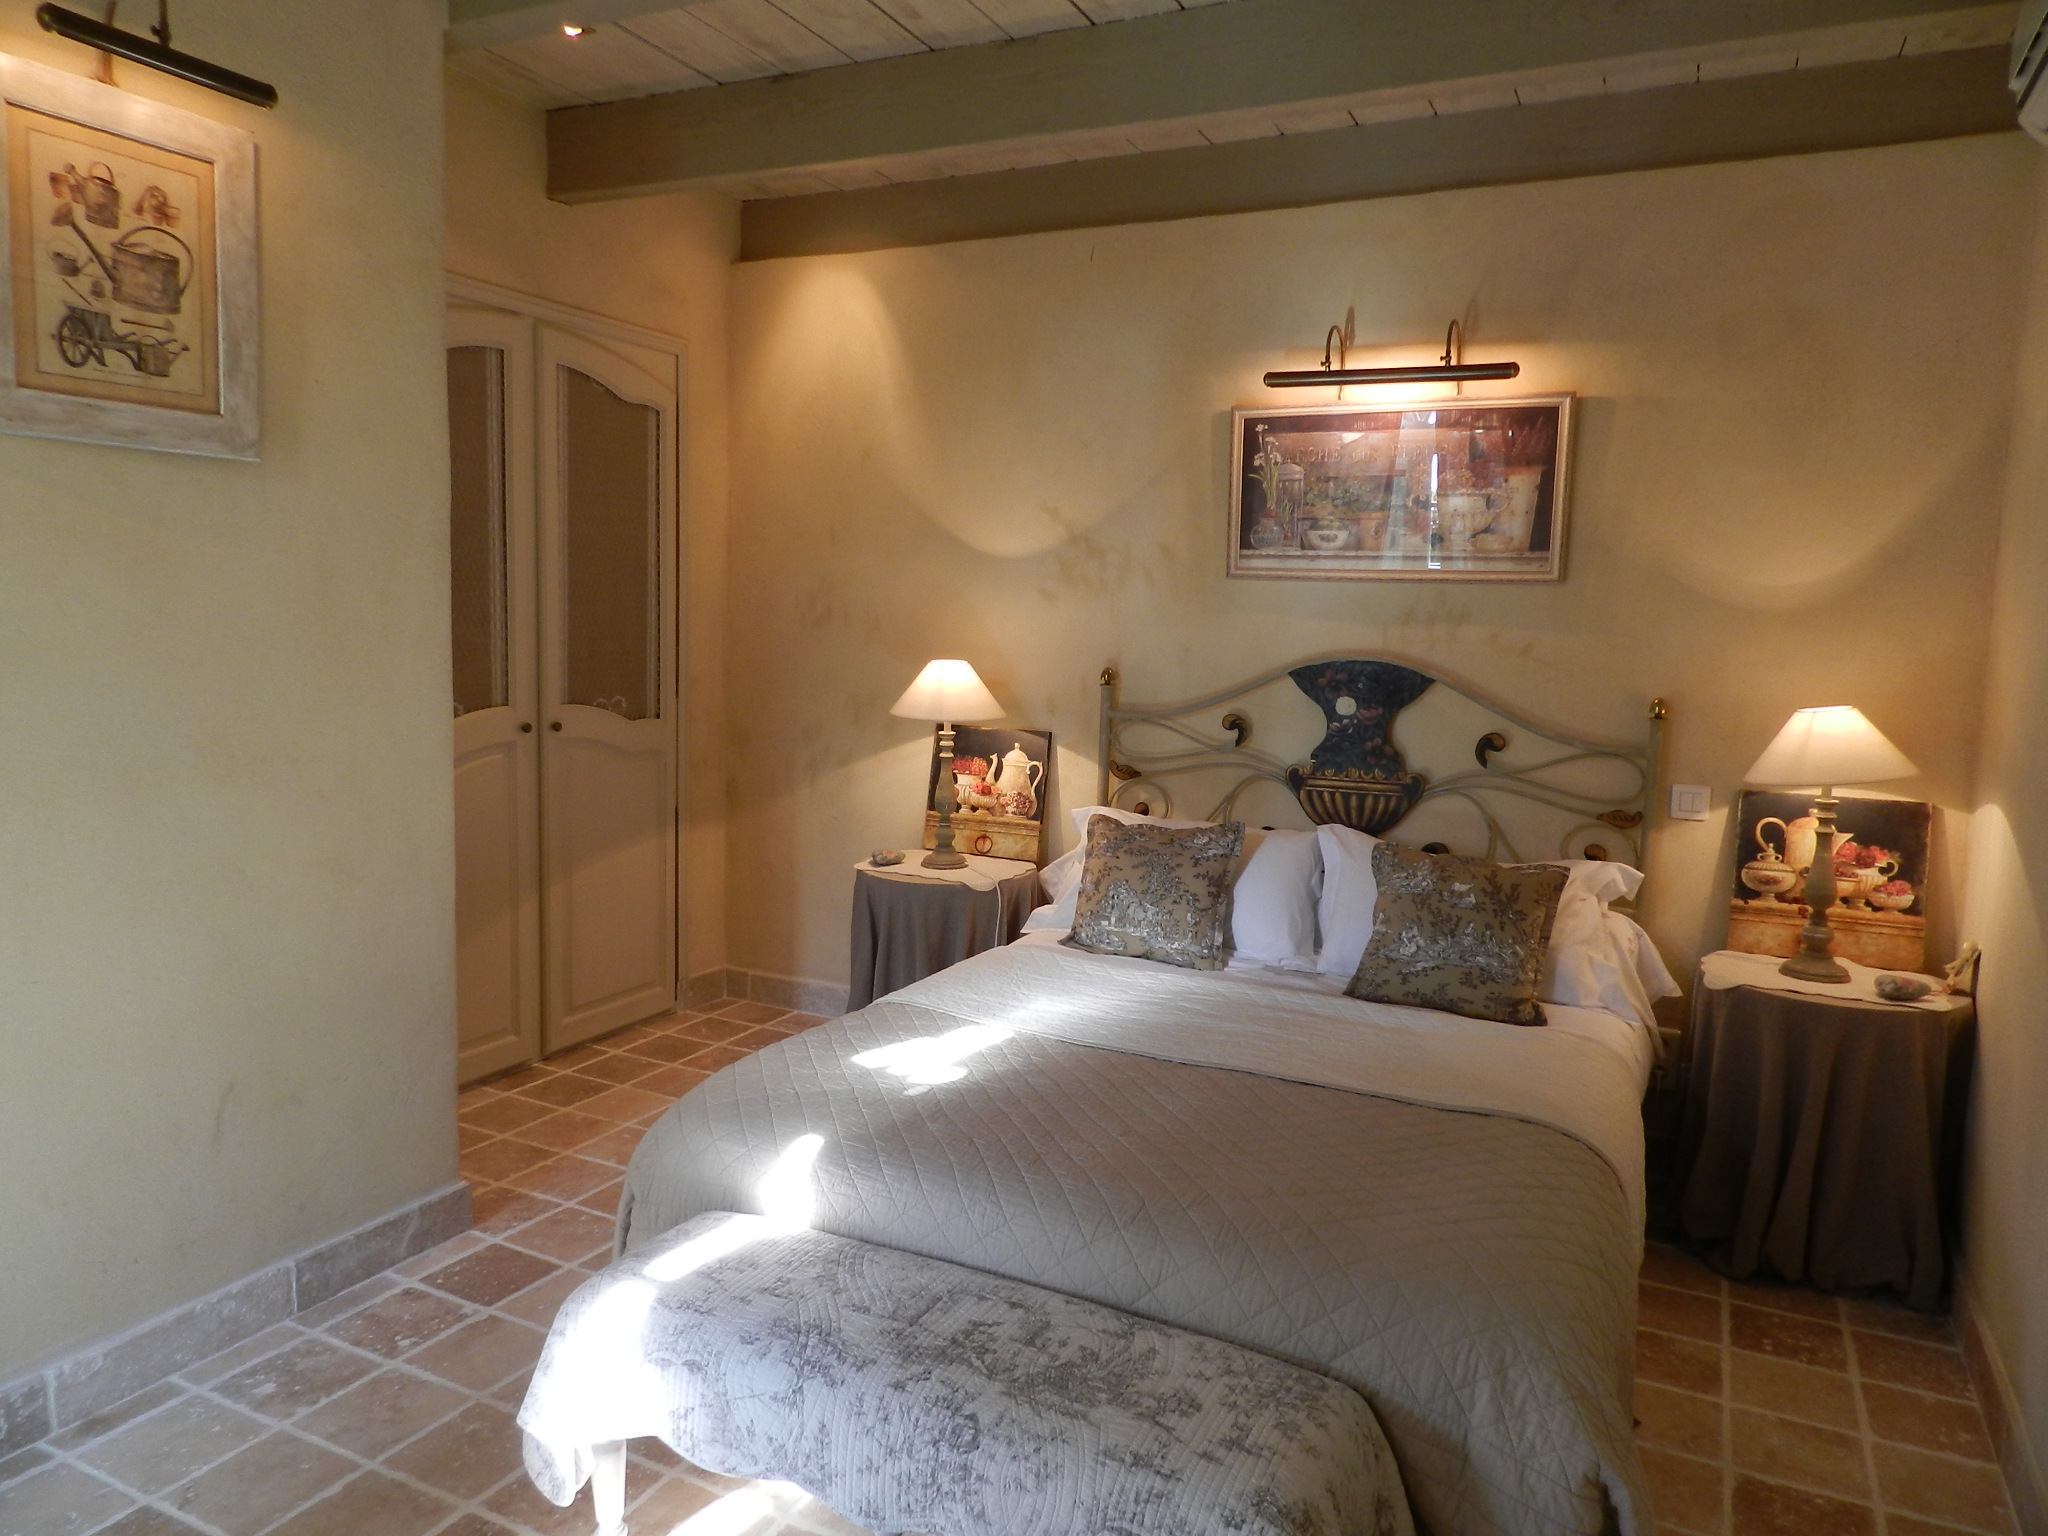 Maison d 39 h tes et chambres d 39 h tes et g te de charme en provence courthezon chambre syrah - Chambre d hote de charme provence ...